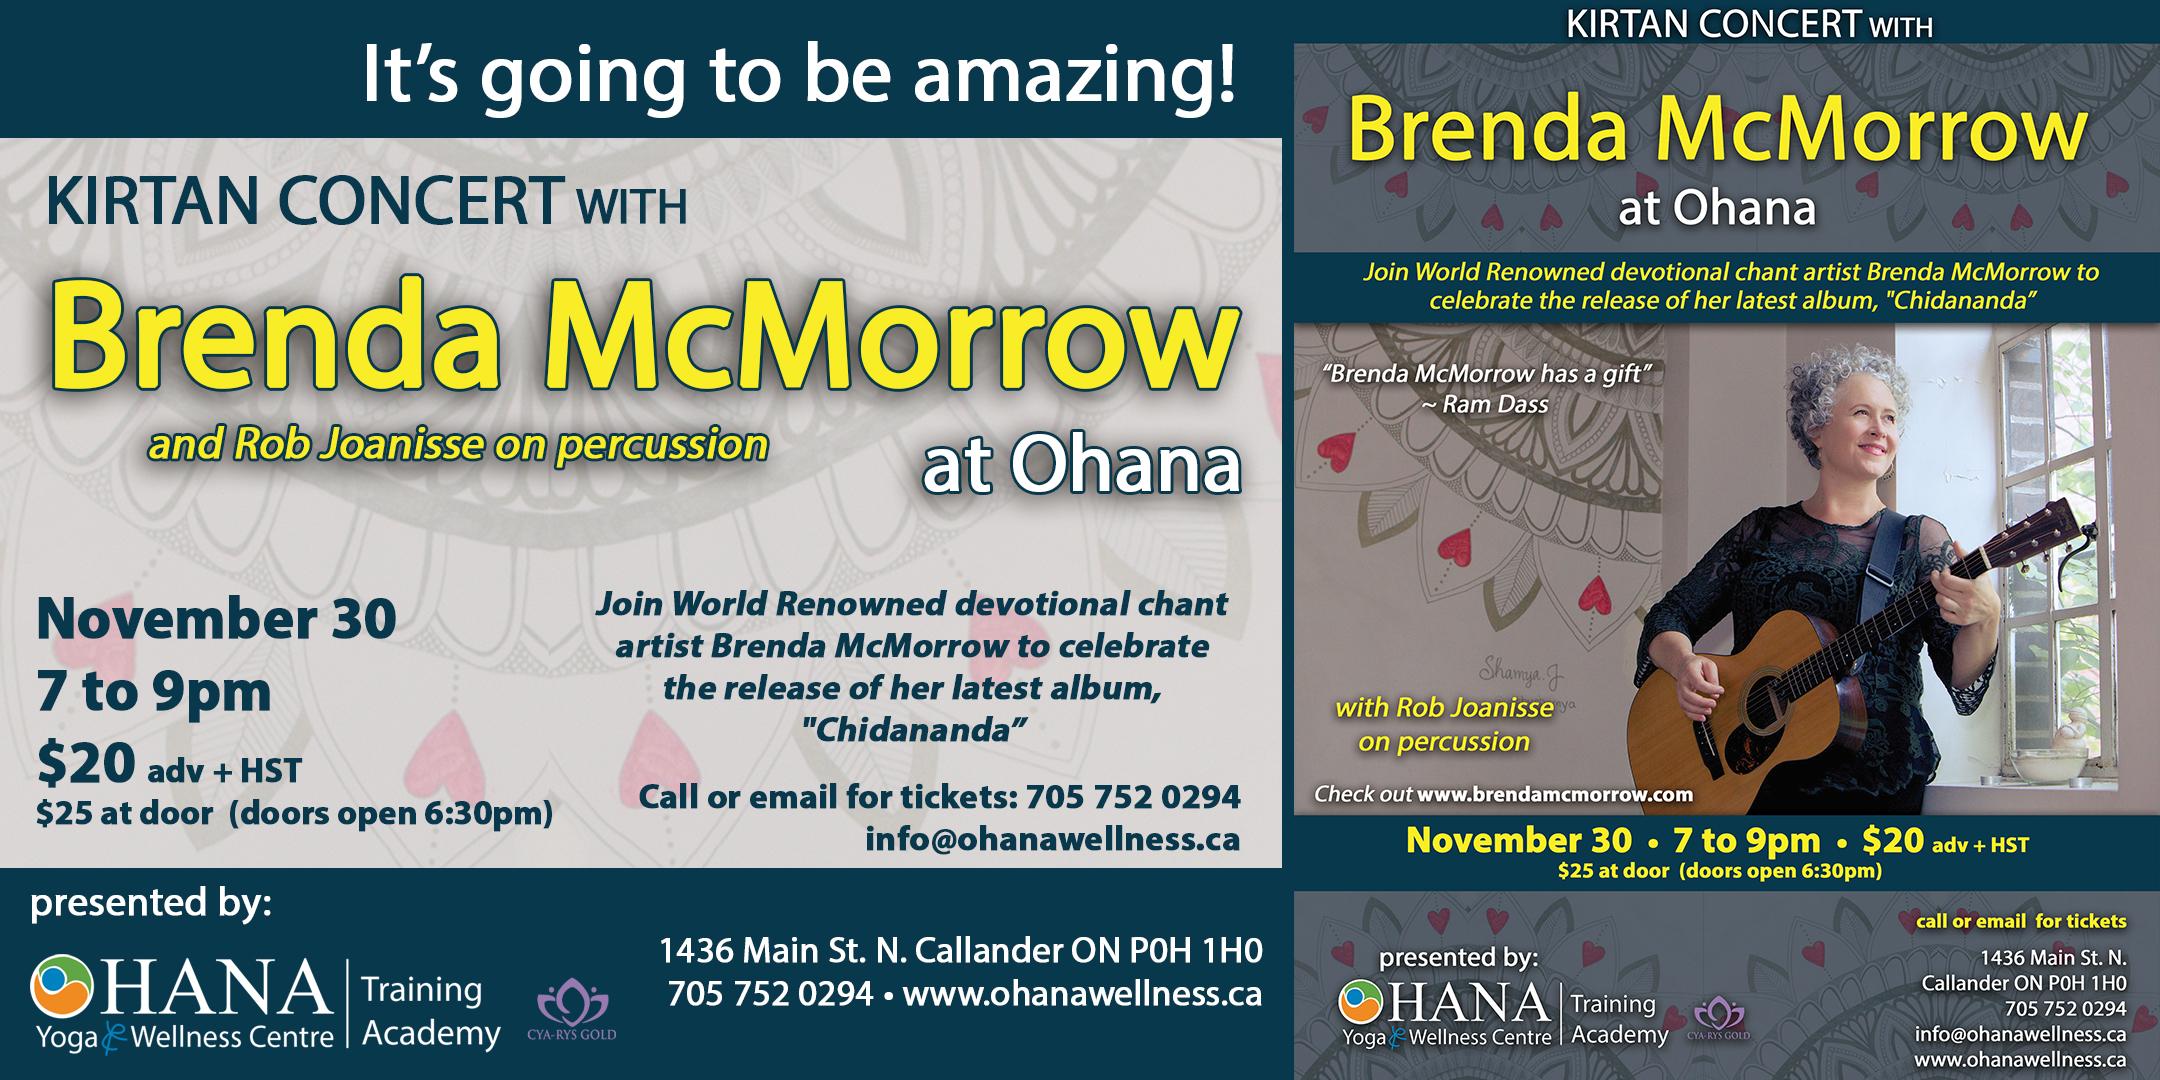 Kirtan Concert with Brenda McMorrow at Ohana Yoga & Wellness Centre